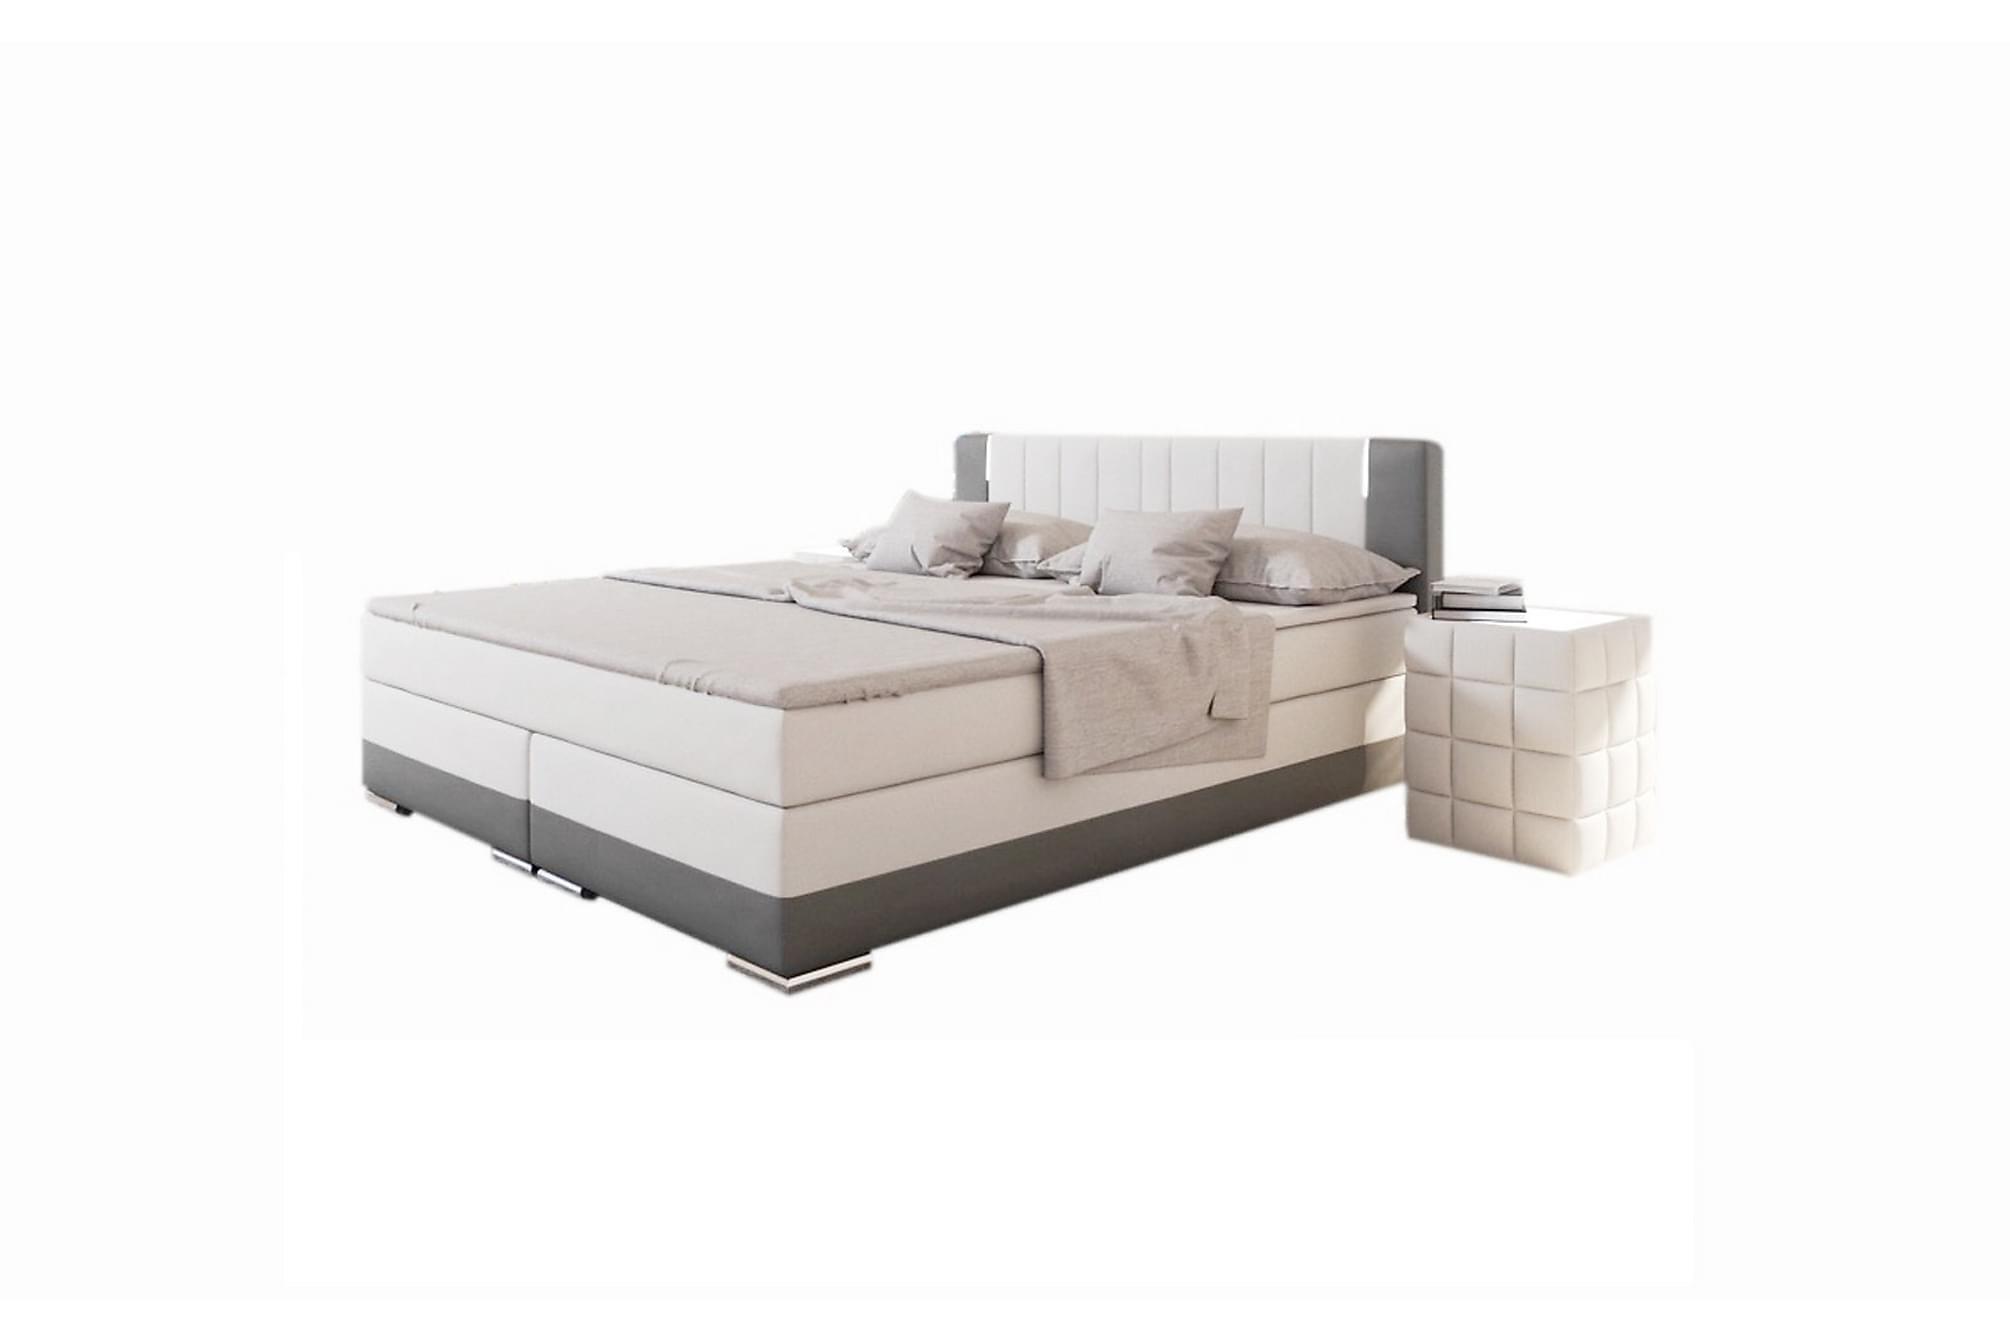 Box spring Säng 200x200 cm LED white / gray artificial leath, Sängar